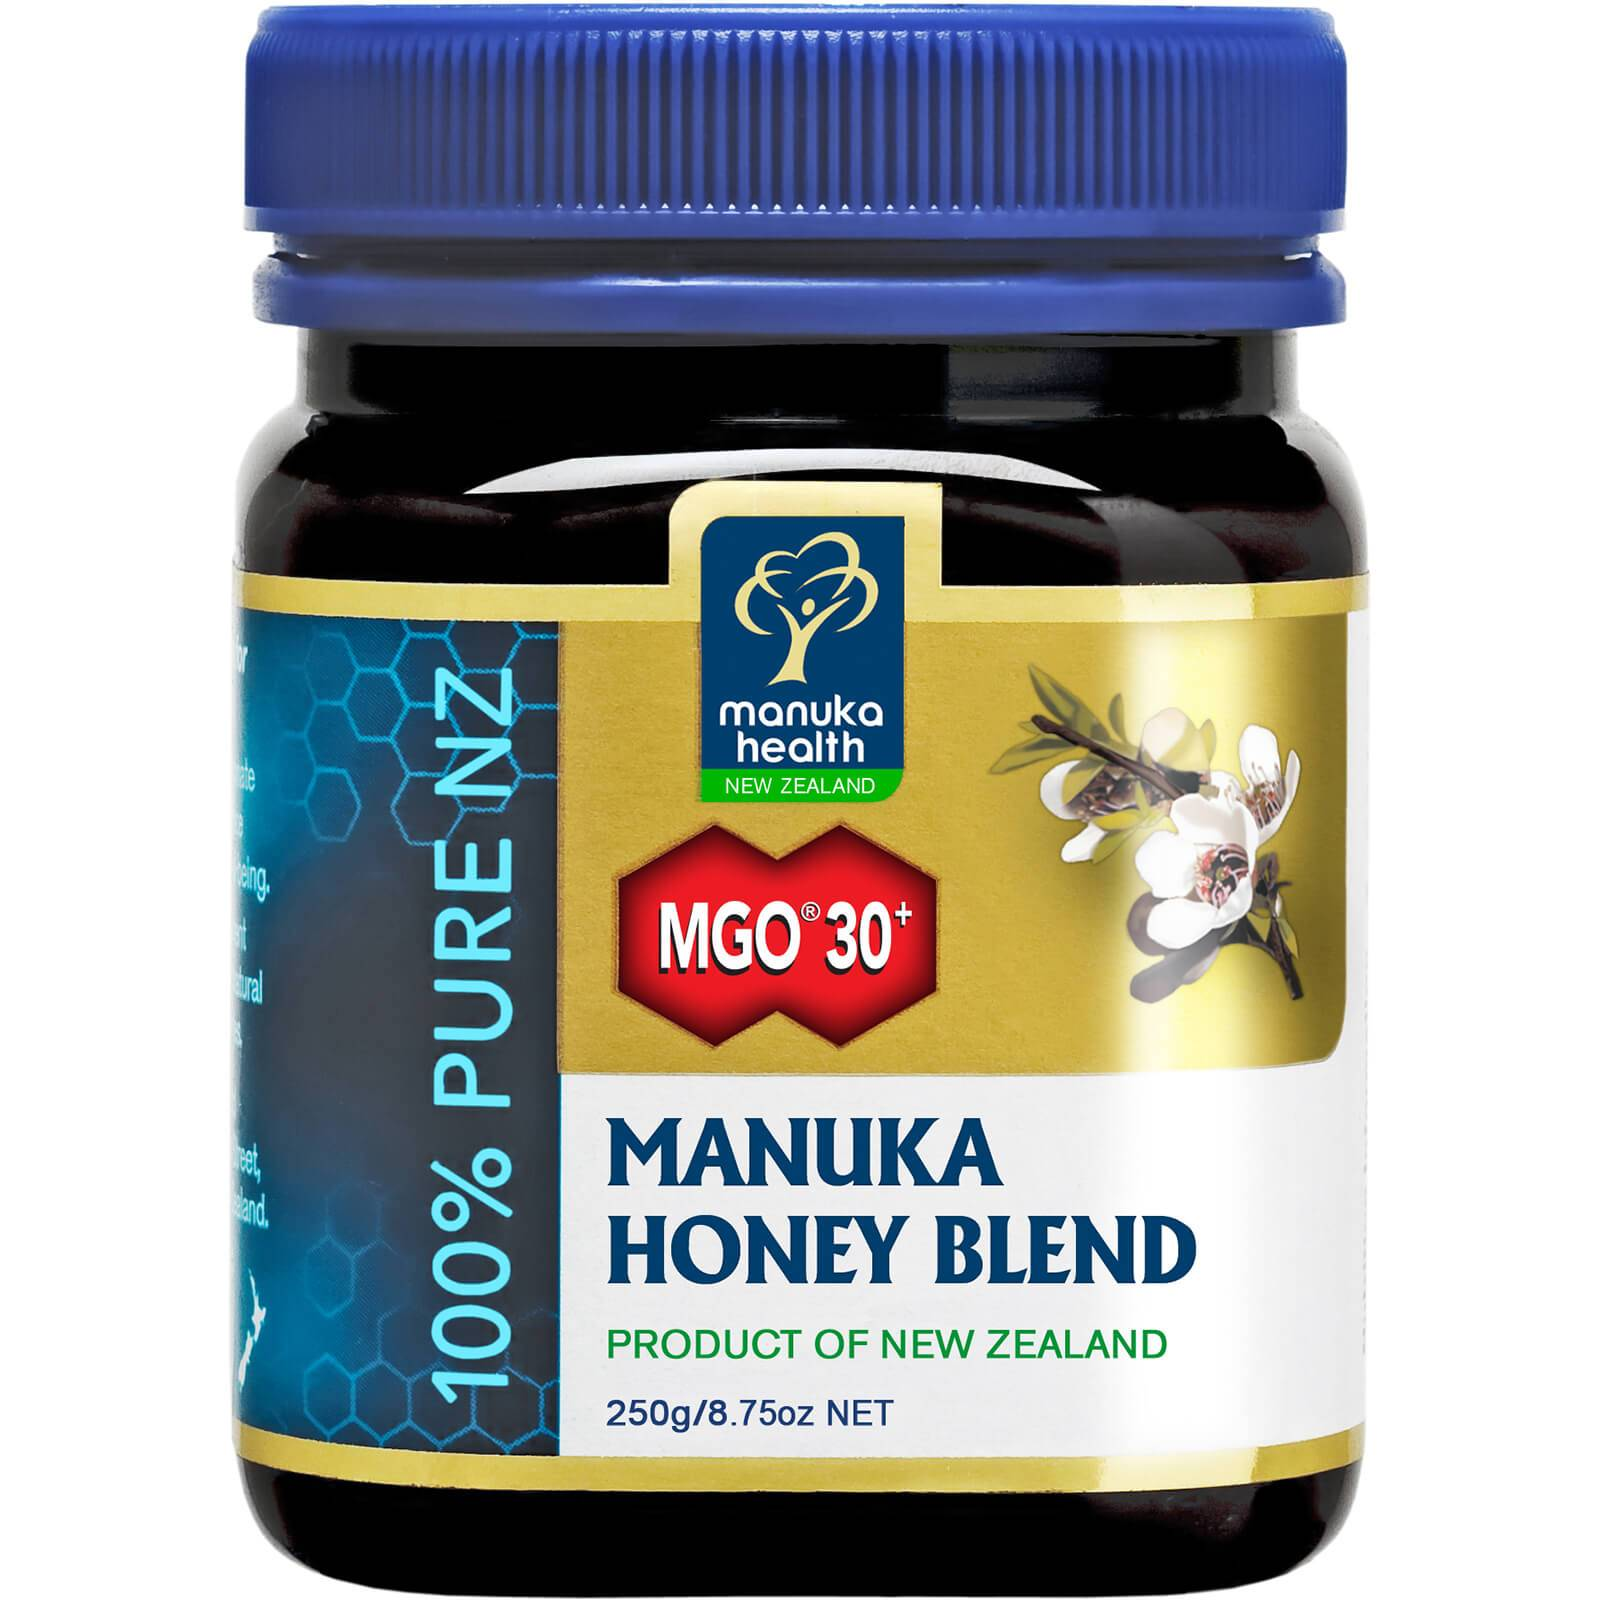 Manuka Health New Zealand Ltd Miel de Manuka MGO 30+ Manuka Health - 250G